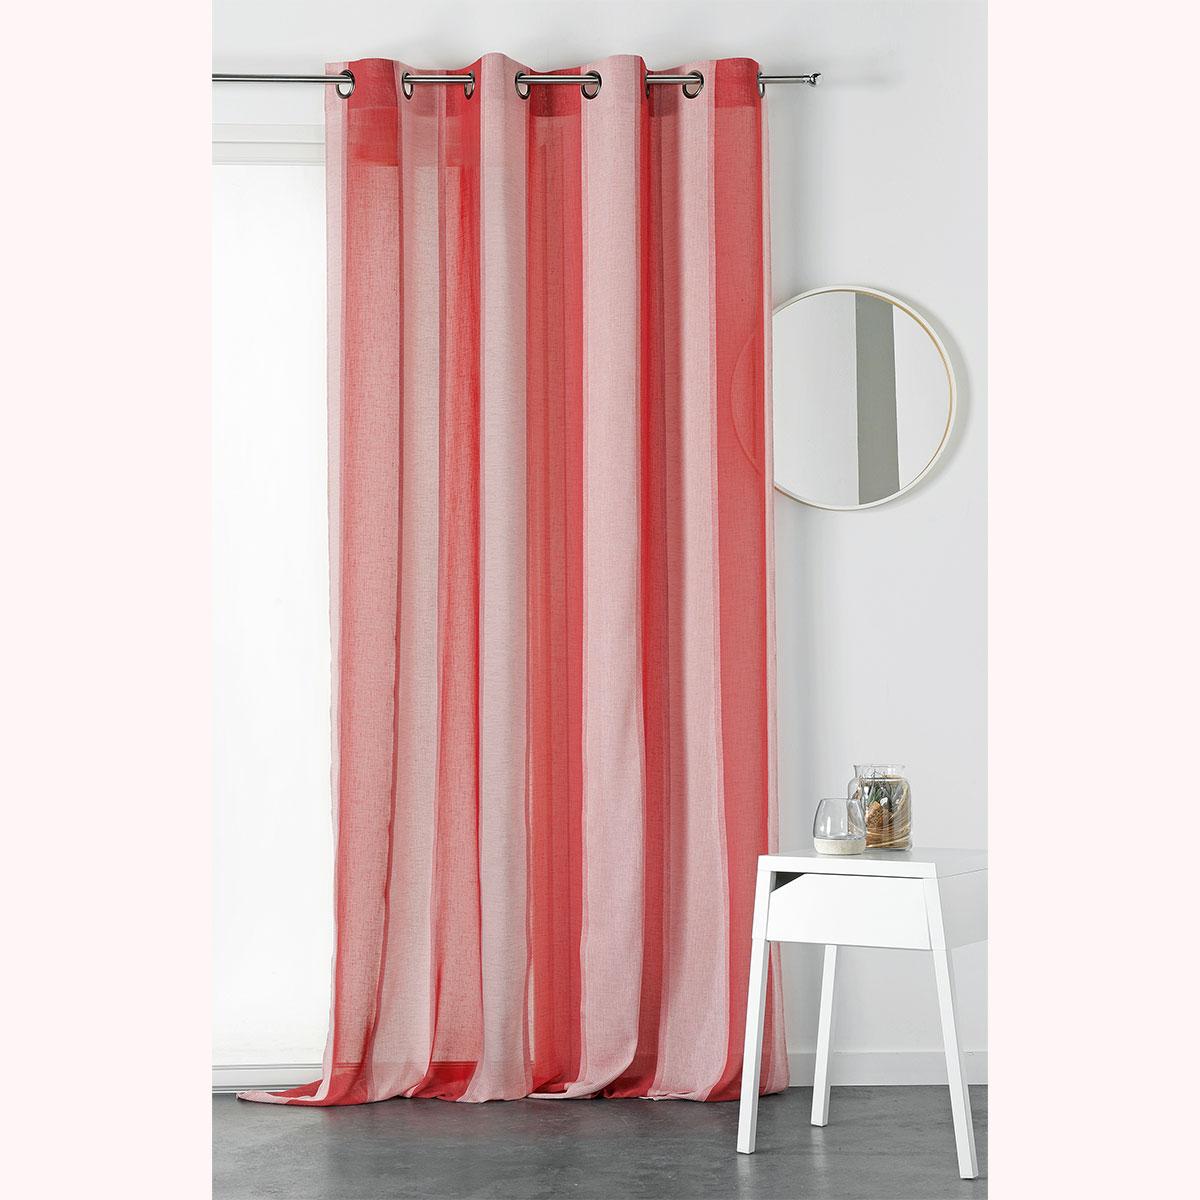 Voilage à rayures bicolores - Rouge - 150 x 270 cm